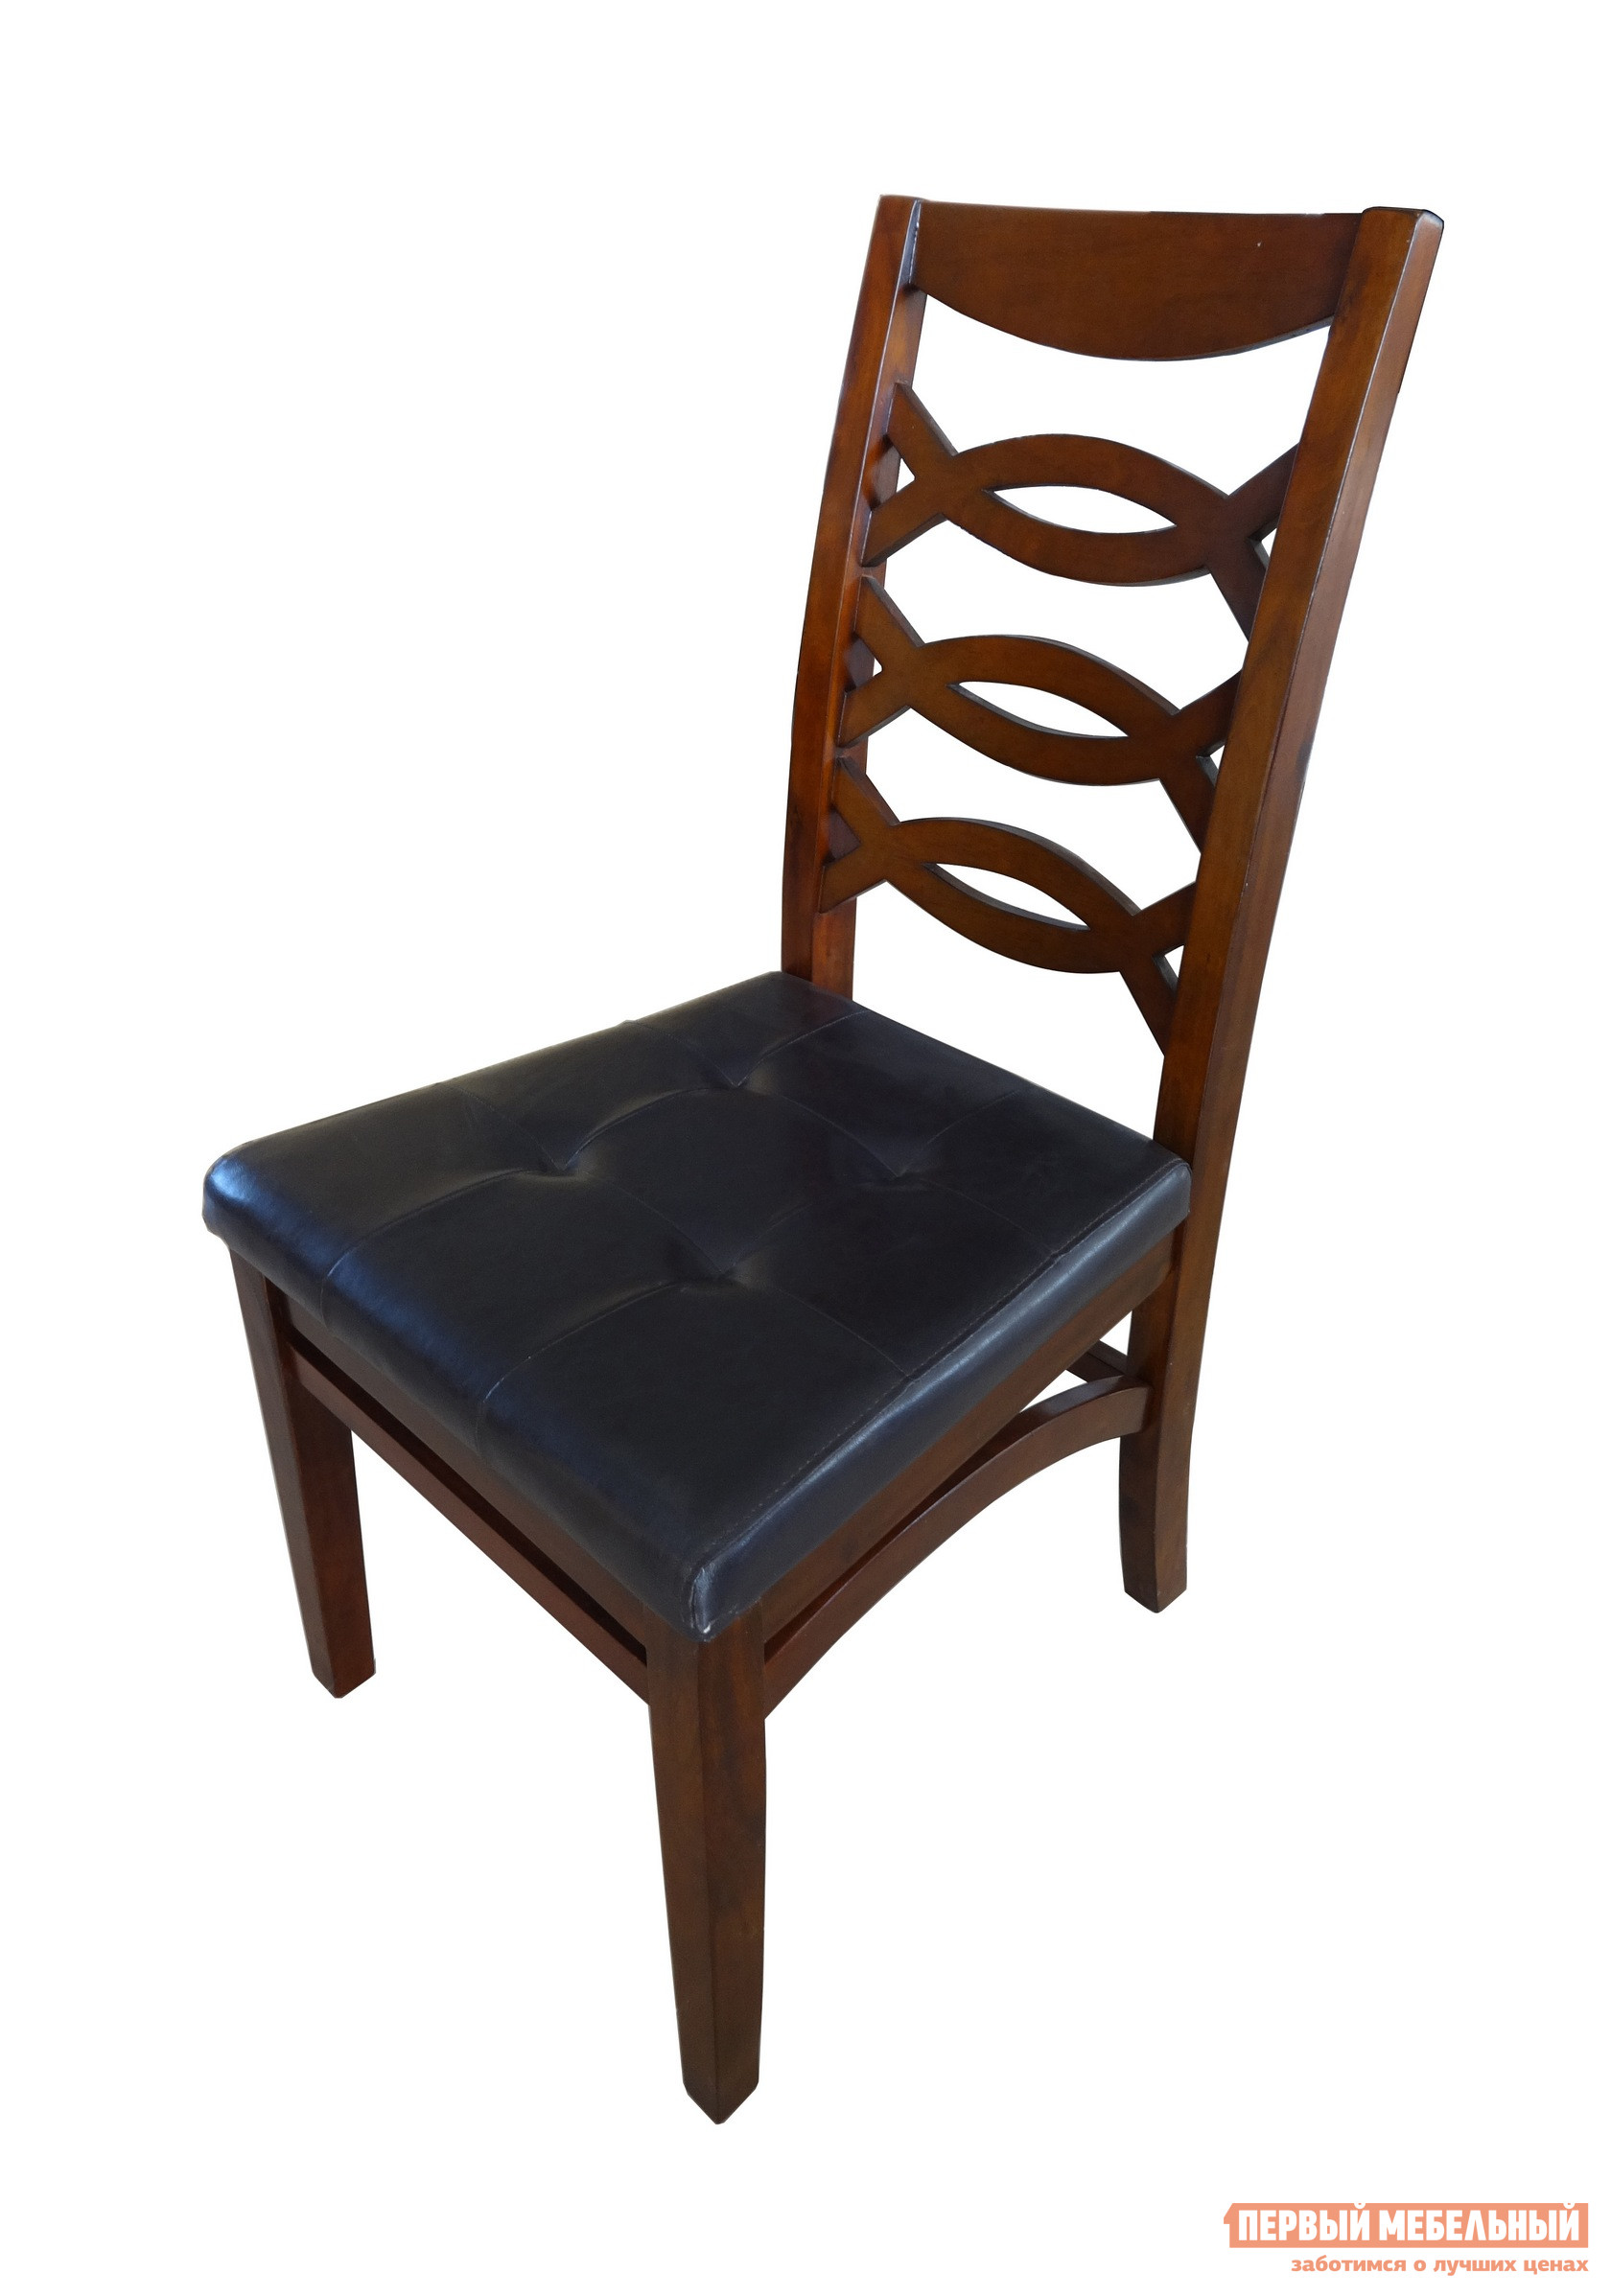 Кухонный стул Tetchair 863 - 48 SC стул компьютерный tetchair zr2013